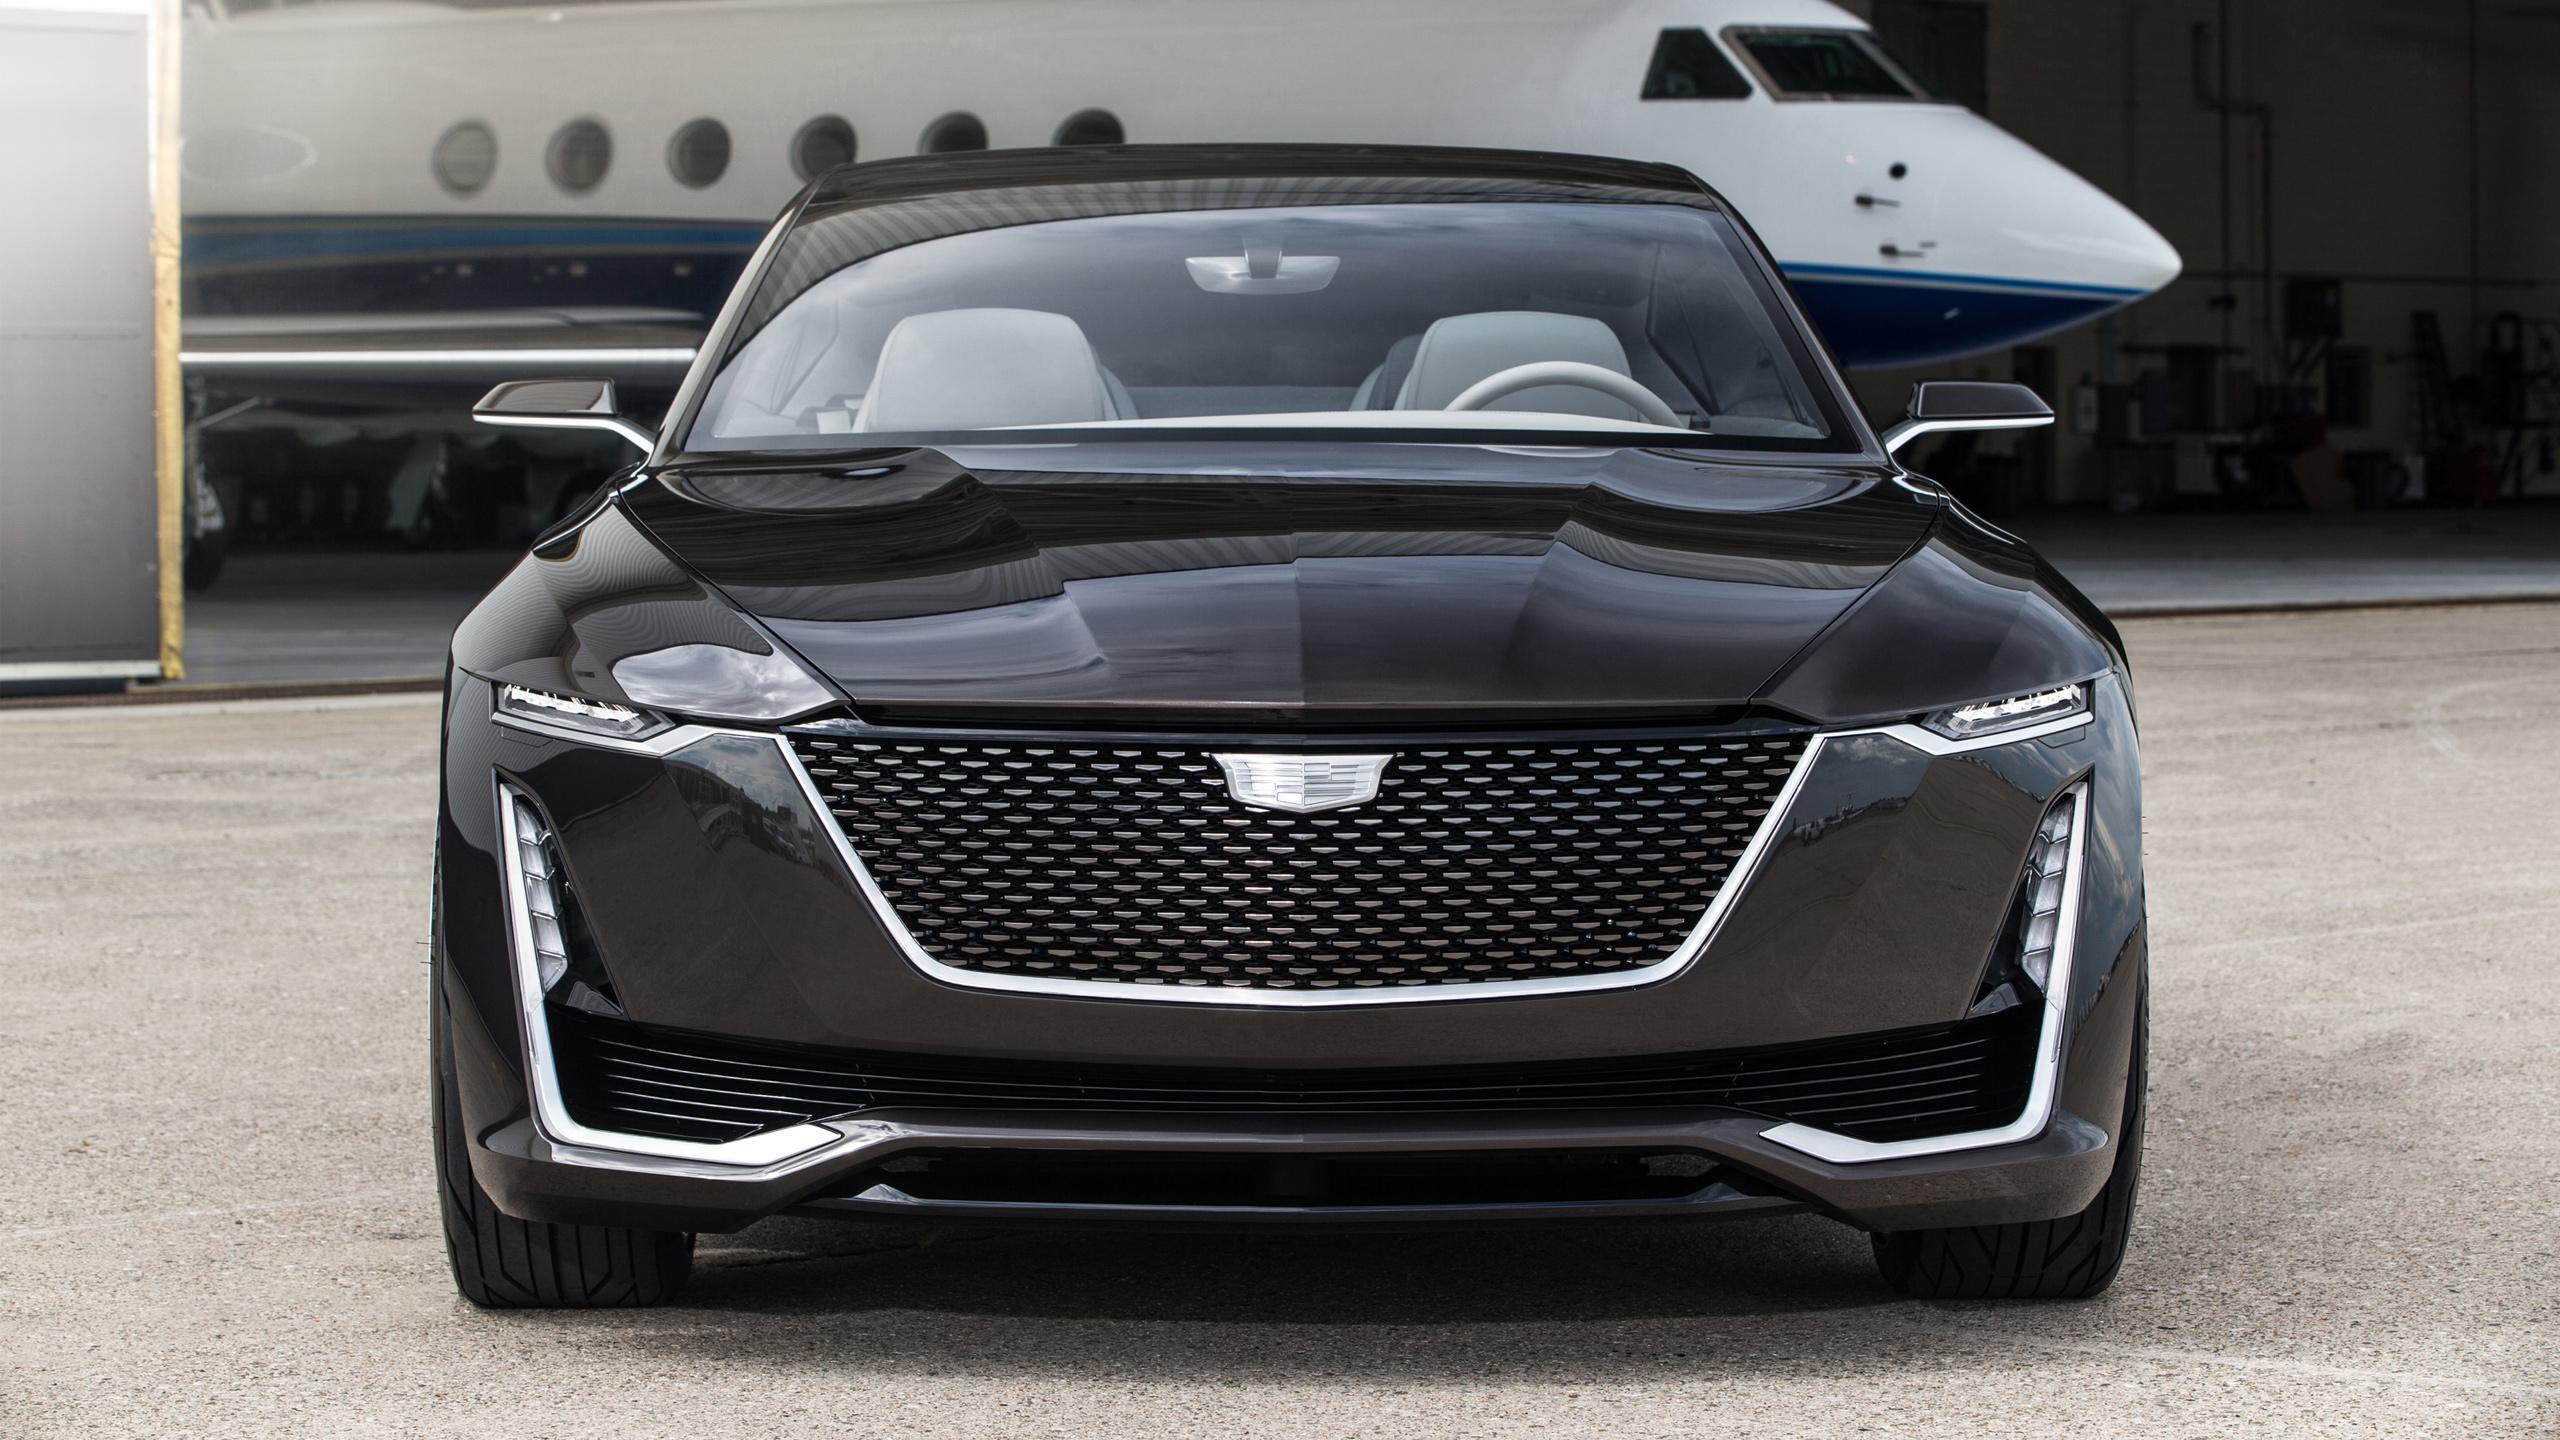 2016 Cadillac Escala Concept 3 Wallpaper | HD Car ...